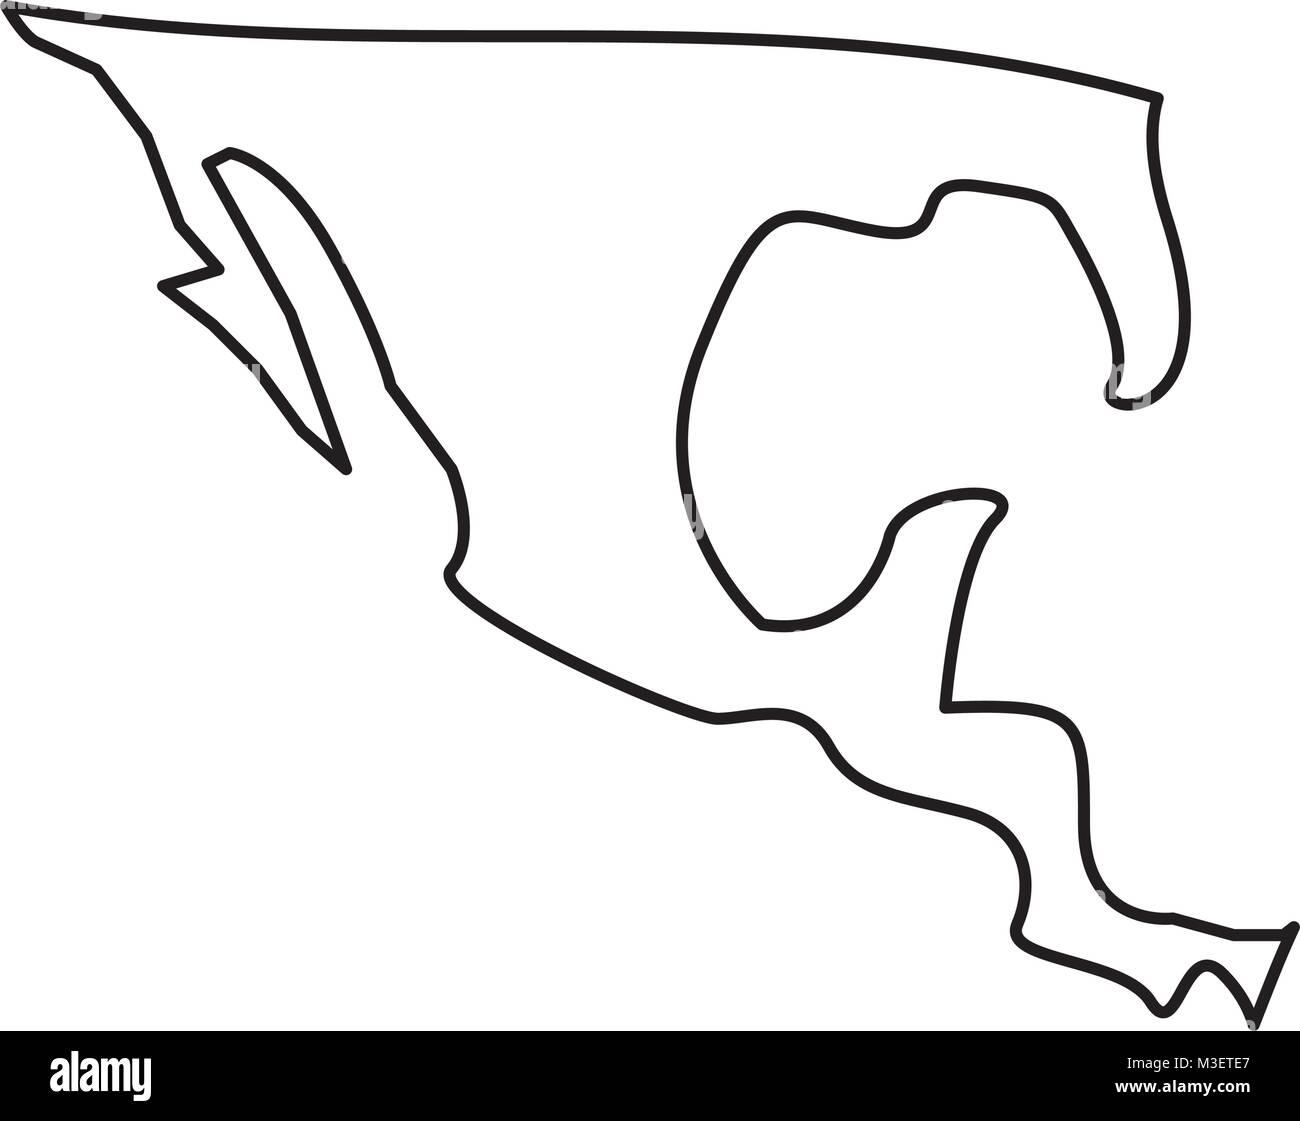 Mexiko Karte Umriss.Silhouette Karte Von Mexiko Land Vektor Abbildung Bild